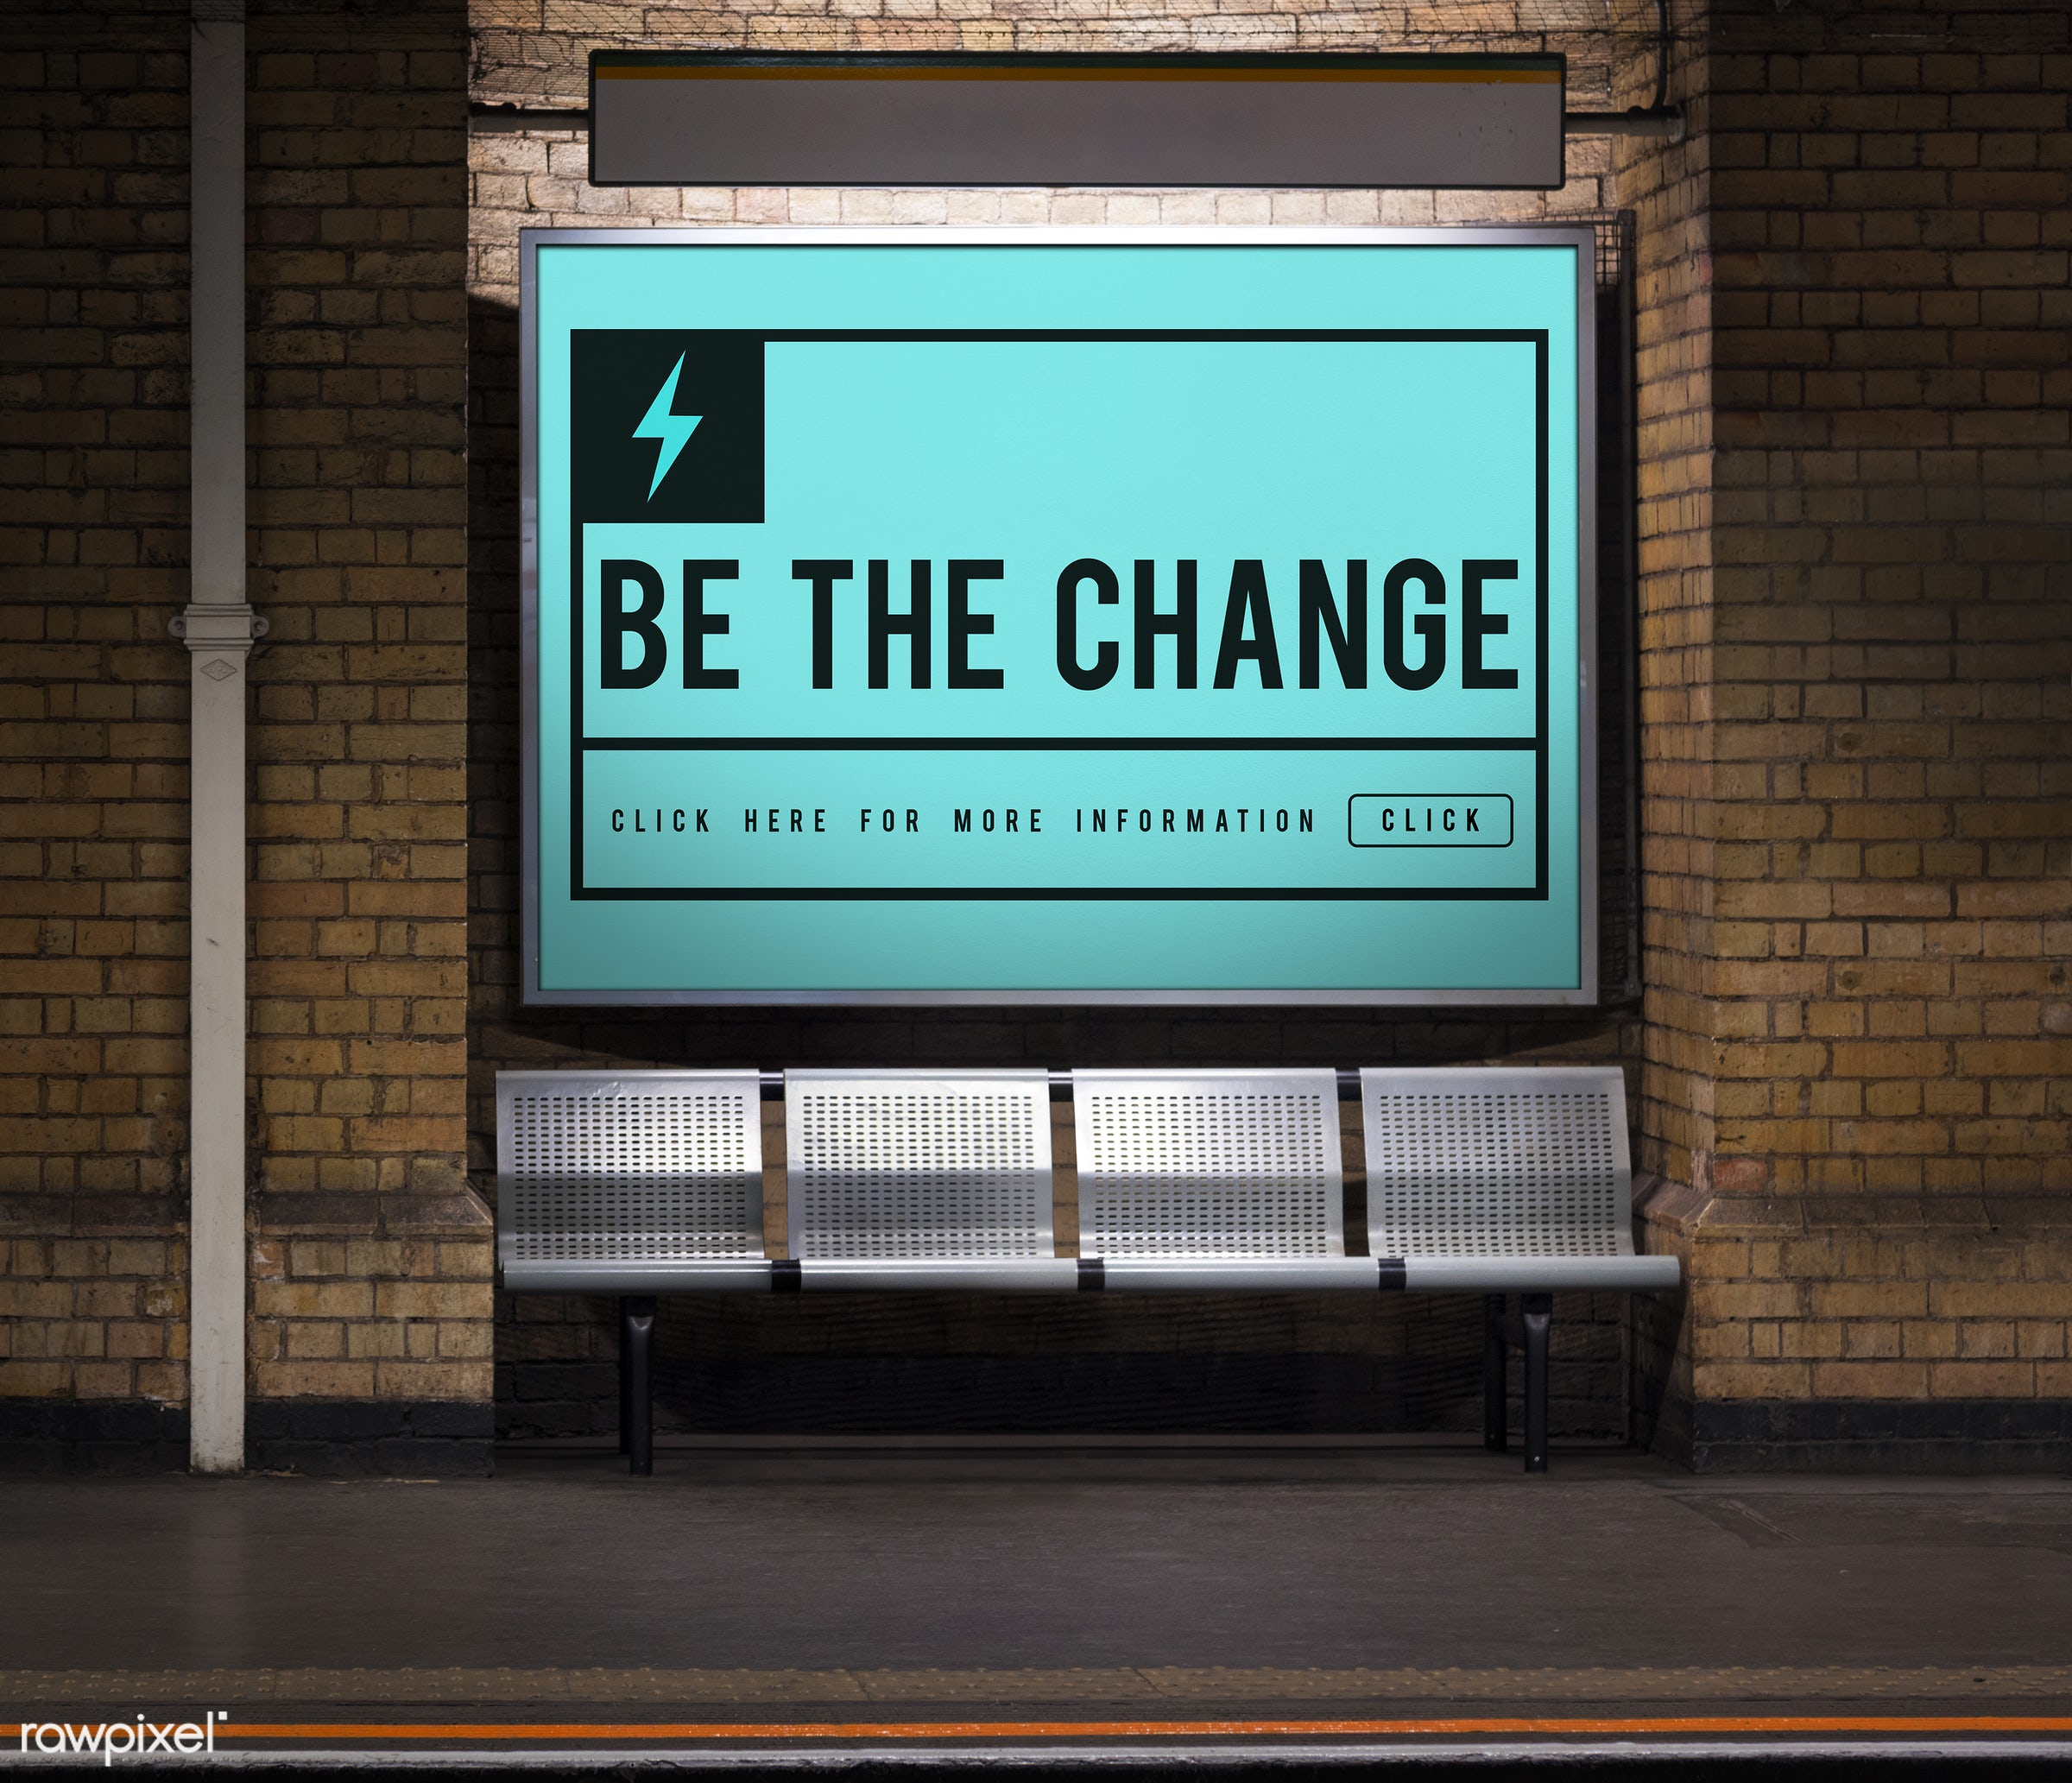 active, be, best, bricks, brickswall, change, difference, dream, empower, empowerment, graphics, inspiration, inspired,...